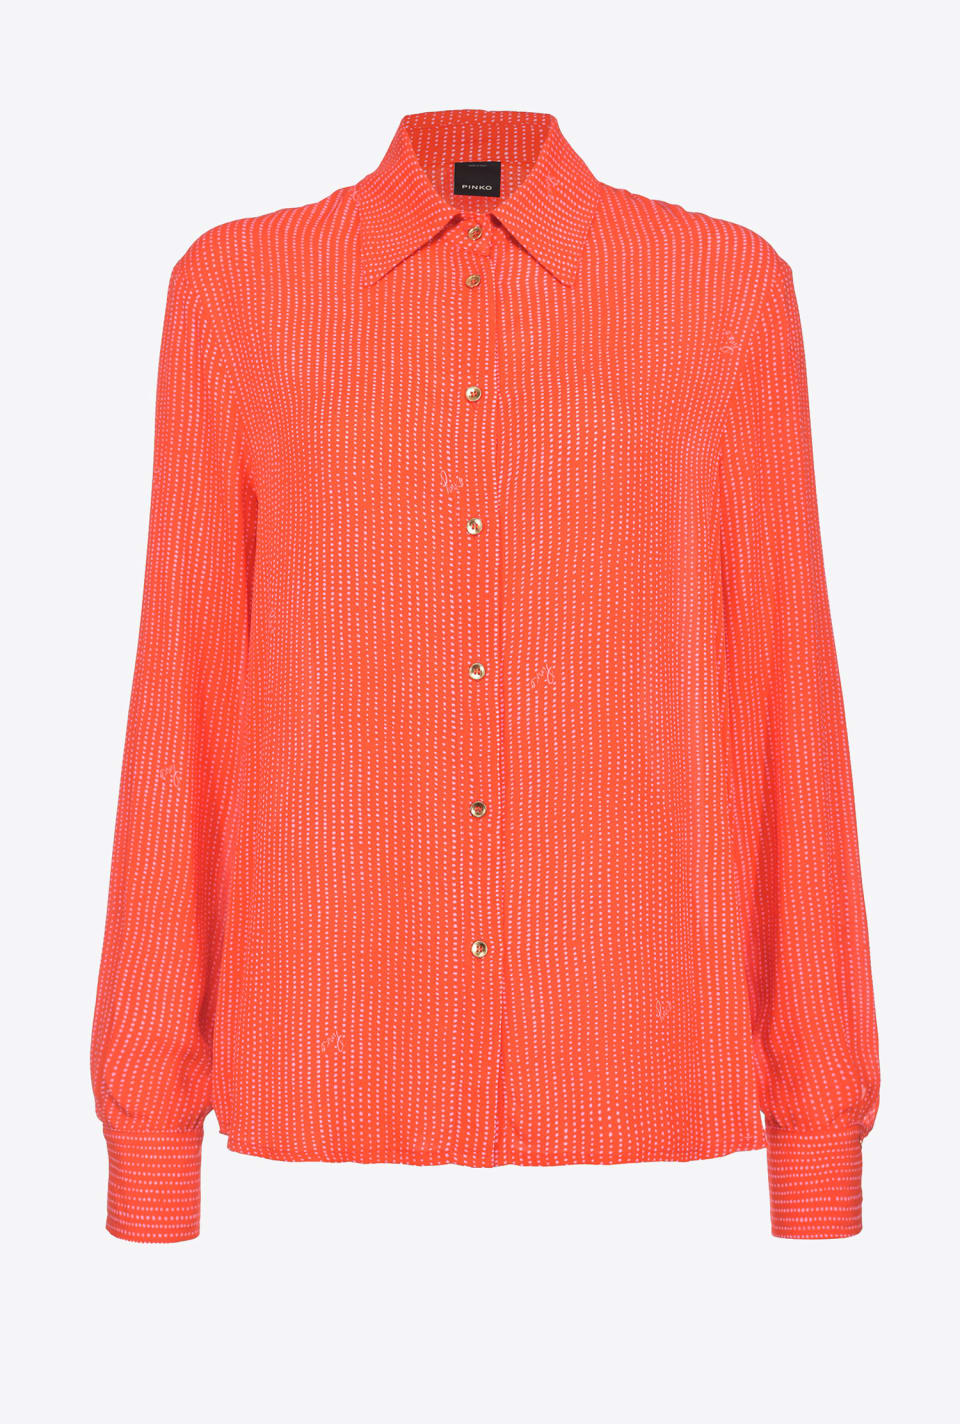 Floral crêpe de chine shirt - Pinko